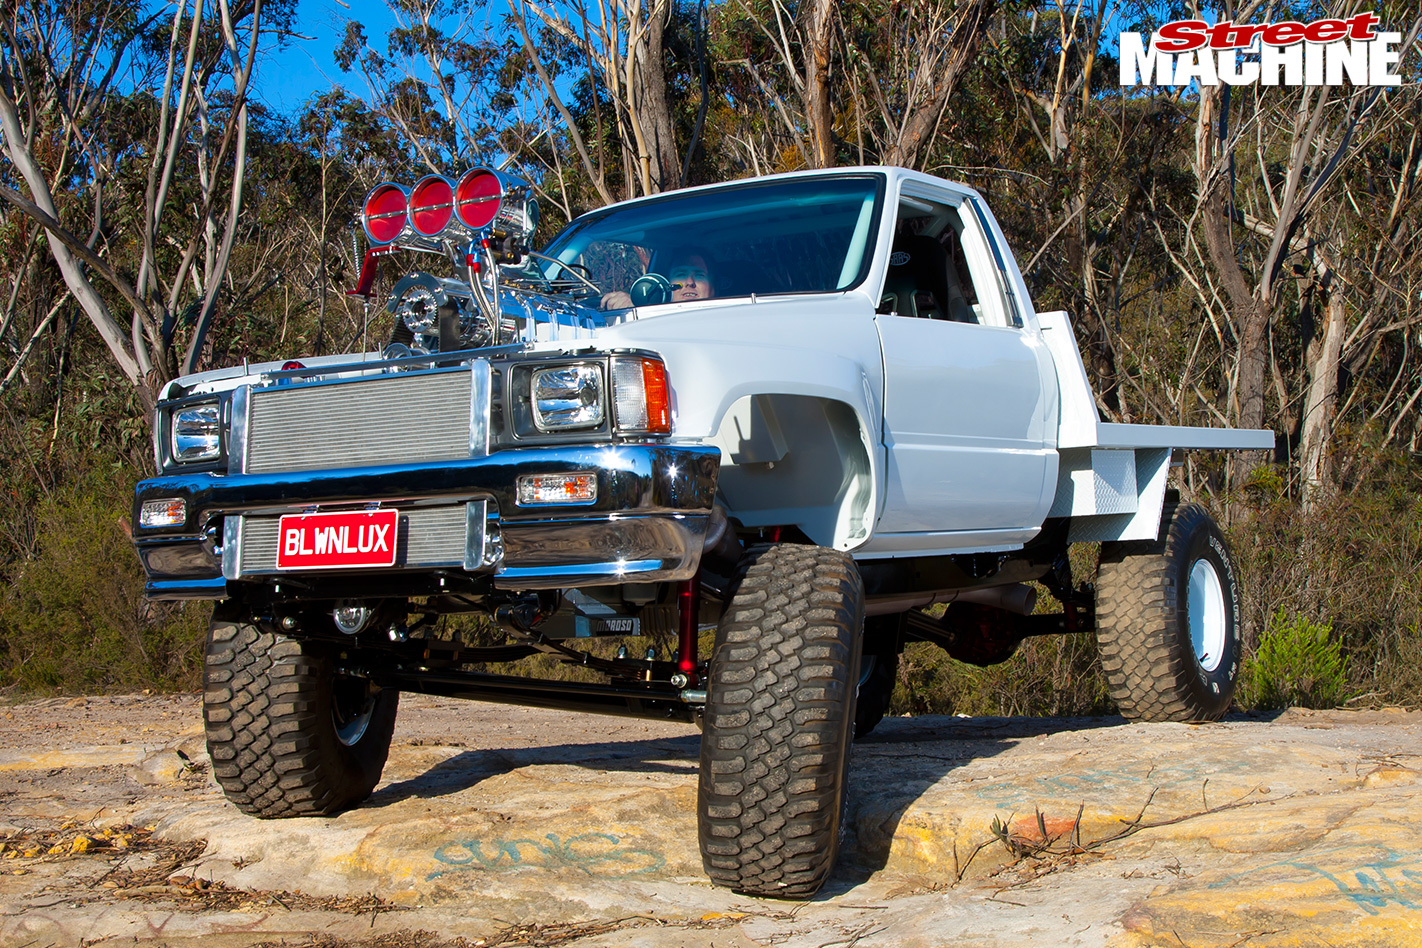 Toyota -Hilux -4x4